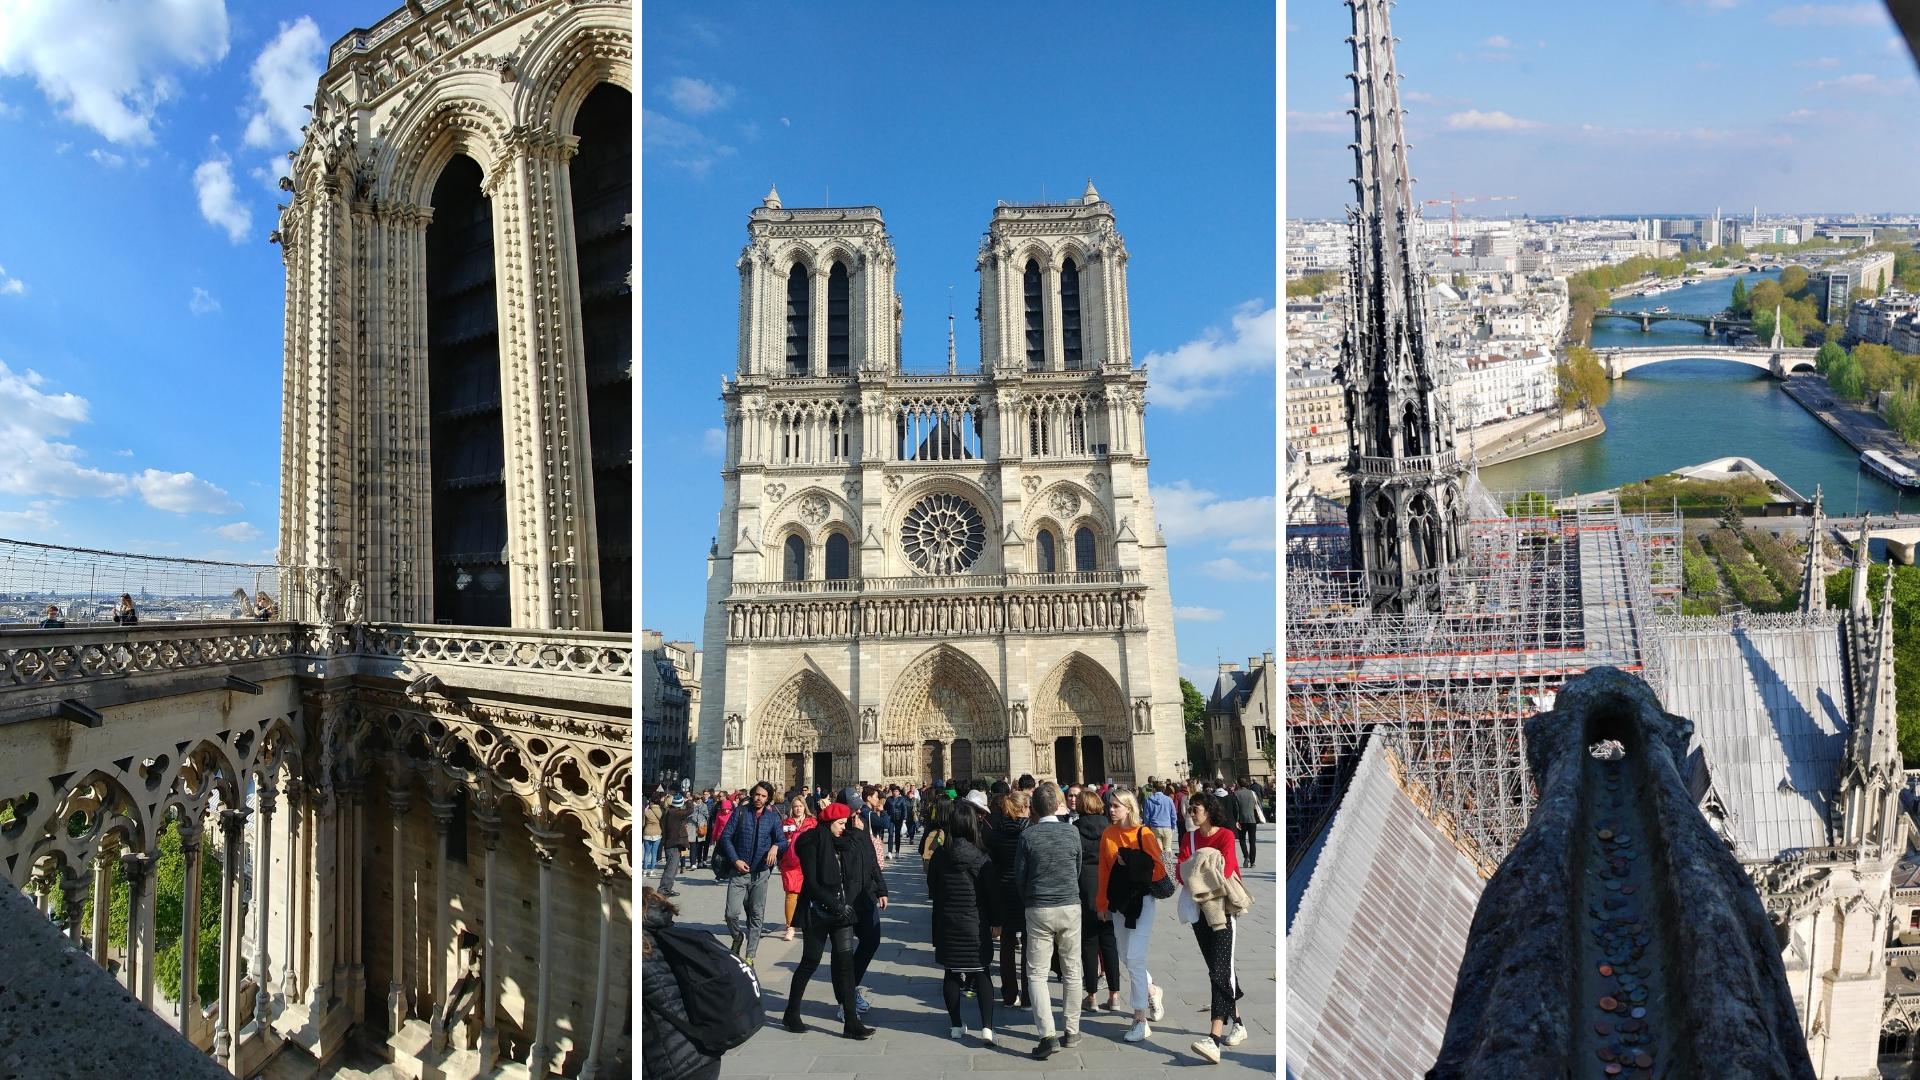 Notre-Dame Paris cathedrale visiter blog voyage france arpenter le chemin